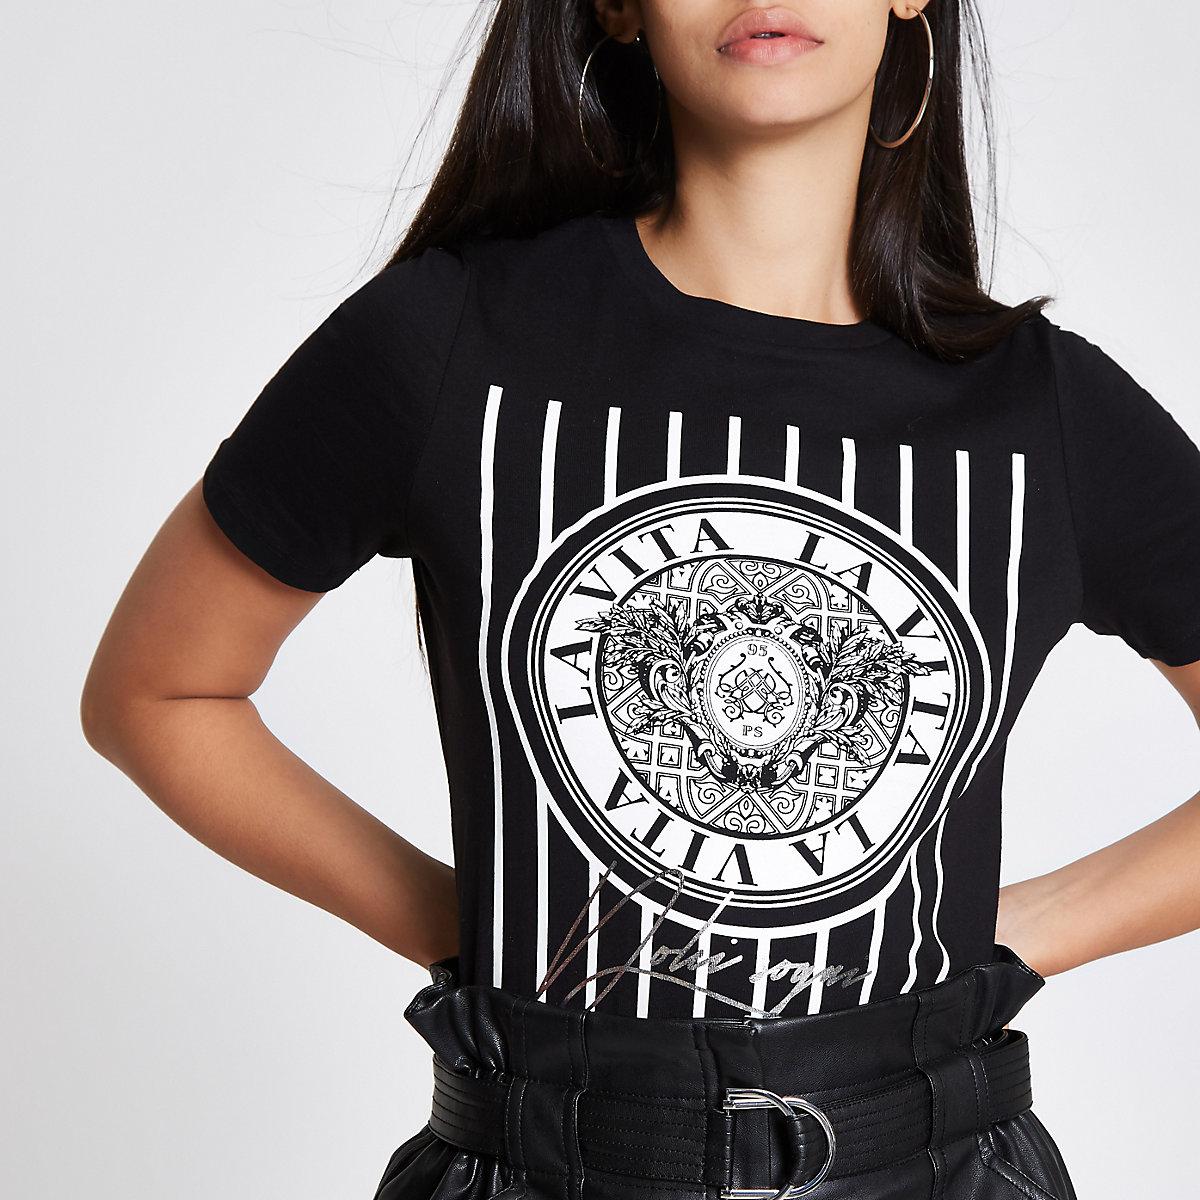 Zwart T-shirt met 'La Vita'-print